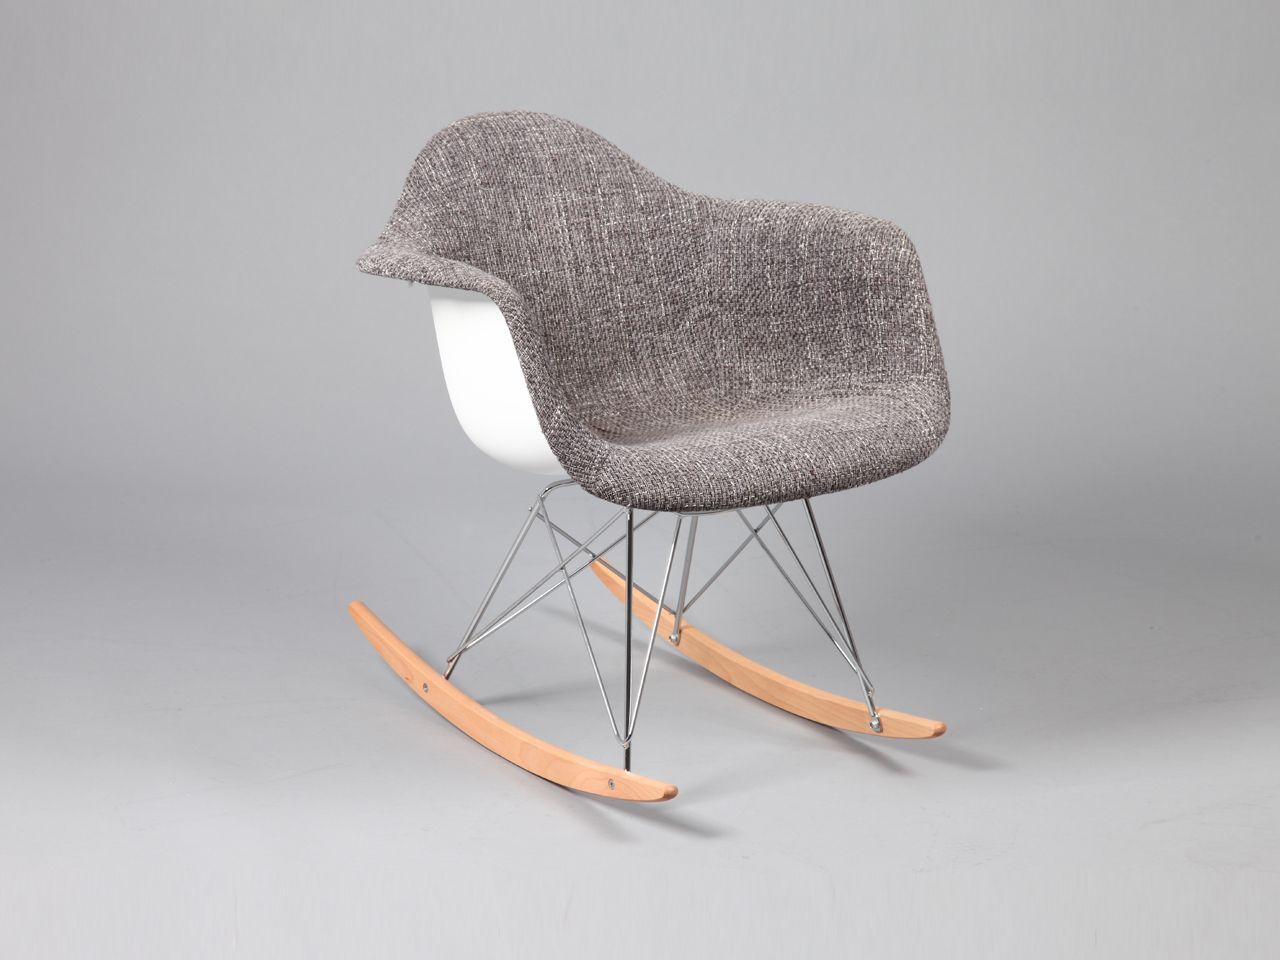 rocker chair sg spring motion patio chairs bird rocking half fabric by comfort design www comfortfurniture com